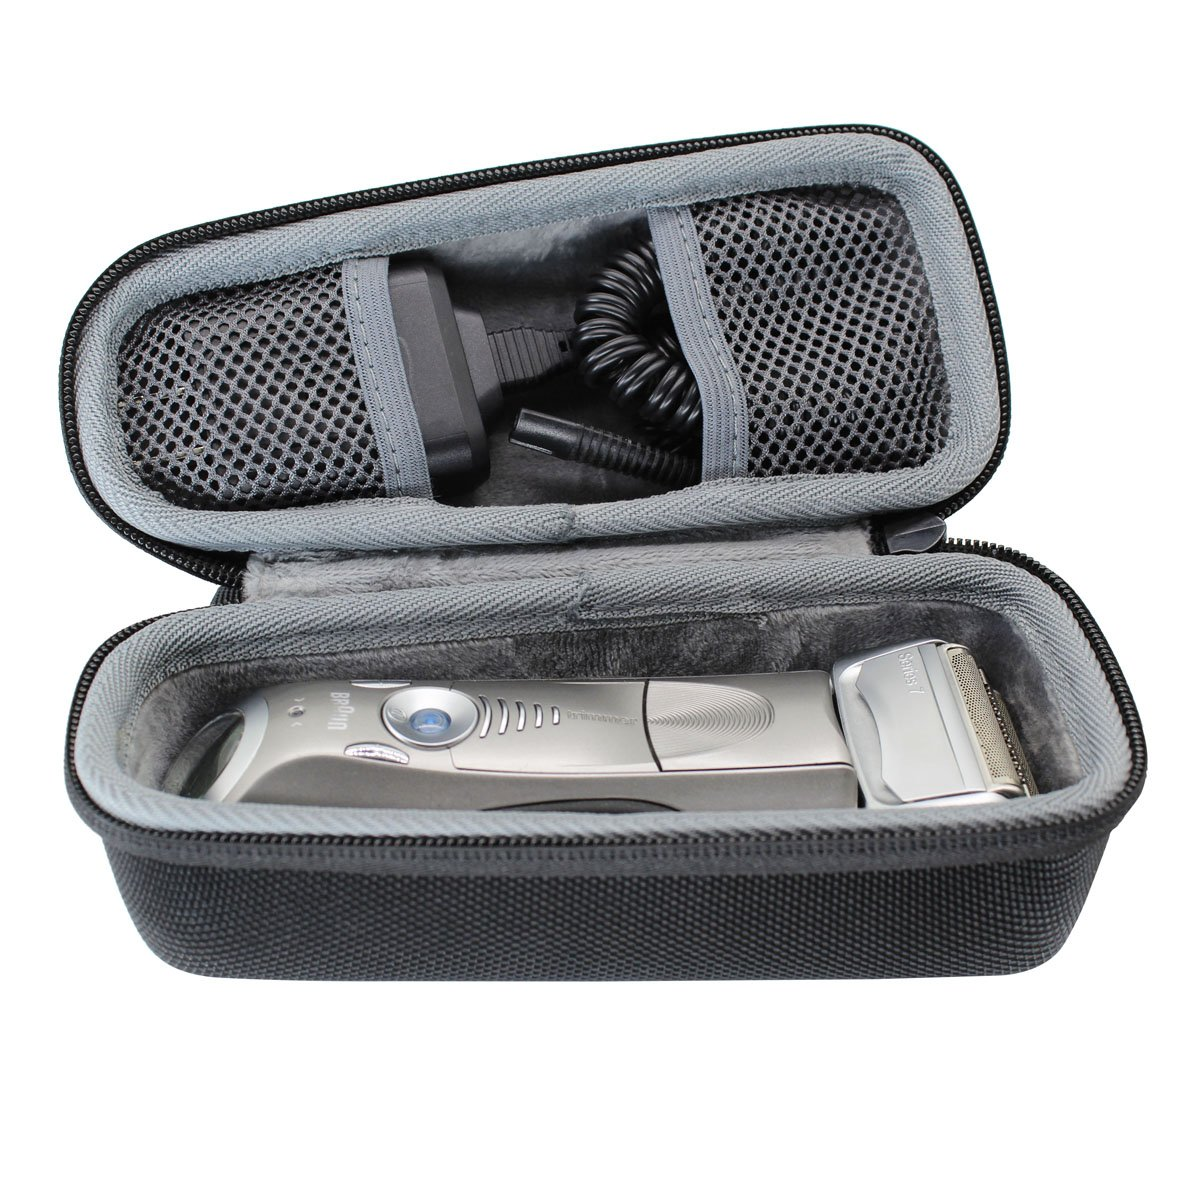 Hard Travel Case Bag for Braun Series 5 7 9 Men's Electric Foil Shaver Razor Trimmer 790cc 7865cc 9290cc 9090cc 5190cc 5050cc by VIVENS